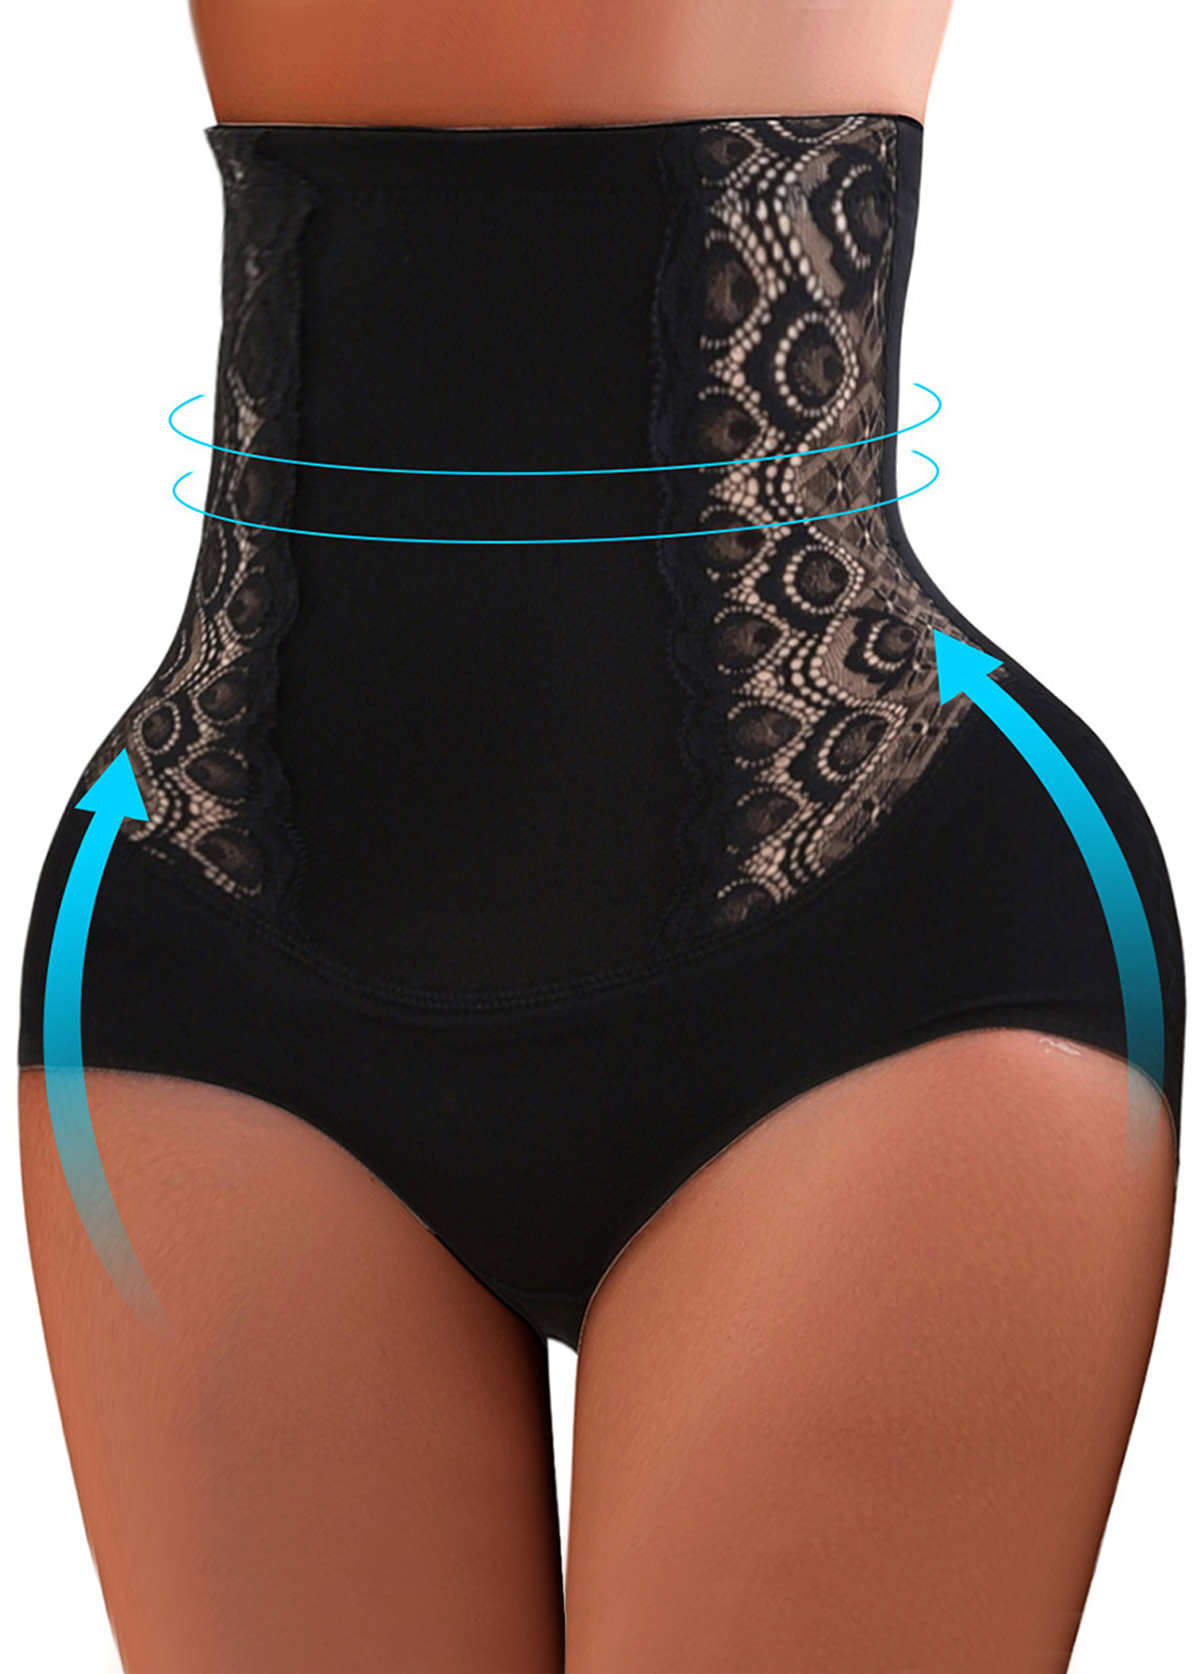 Embroidered High Waist Black Shapewear Panty